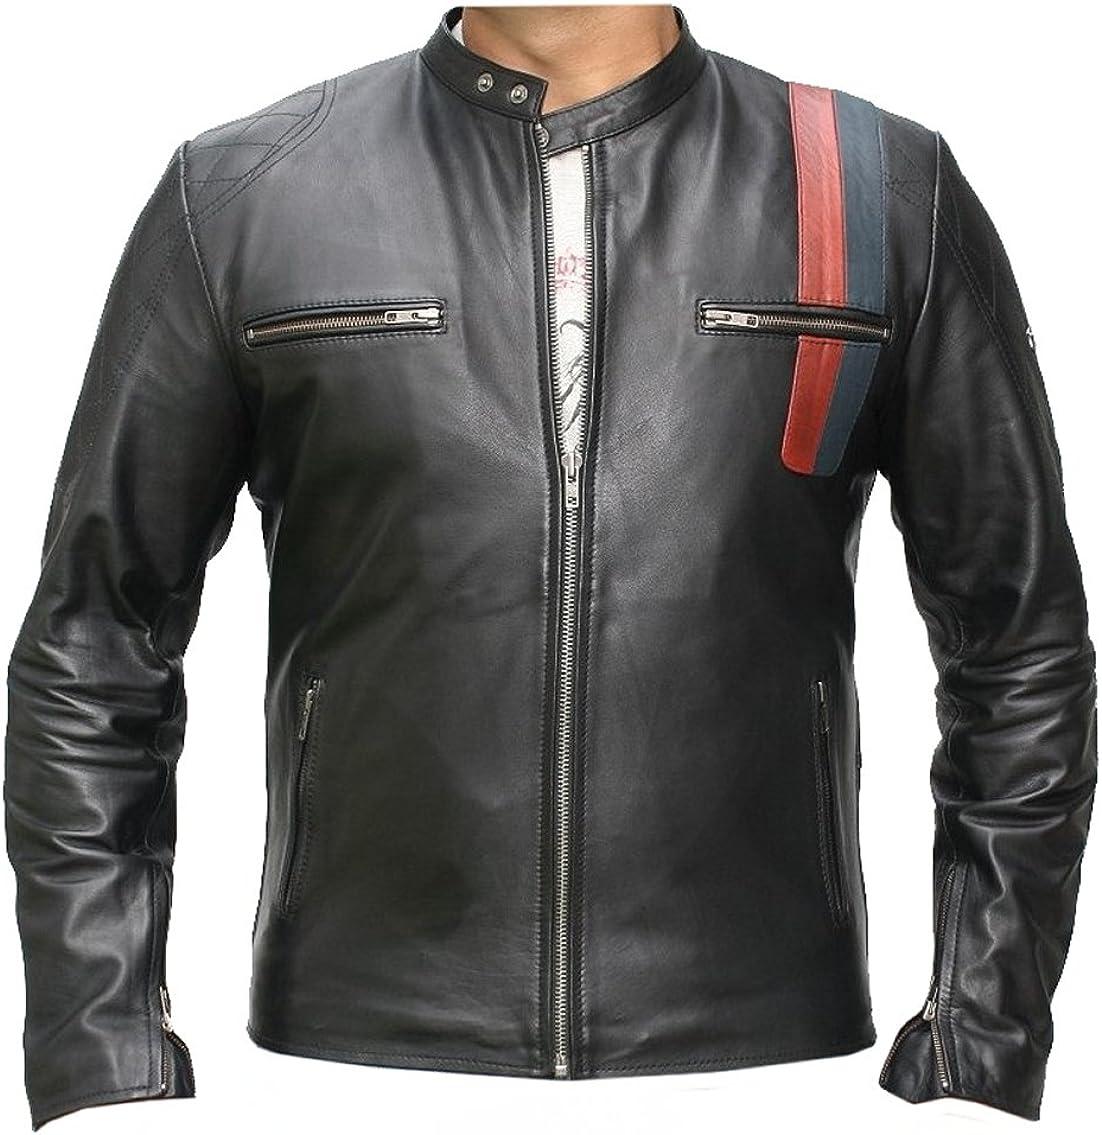 Classyak Men's Black Leather Jacket - Night Rider Sheep Leather